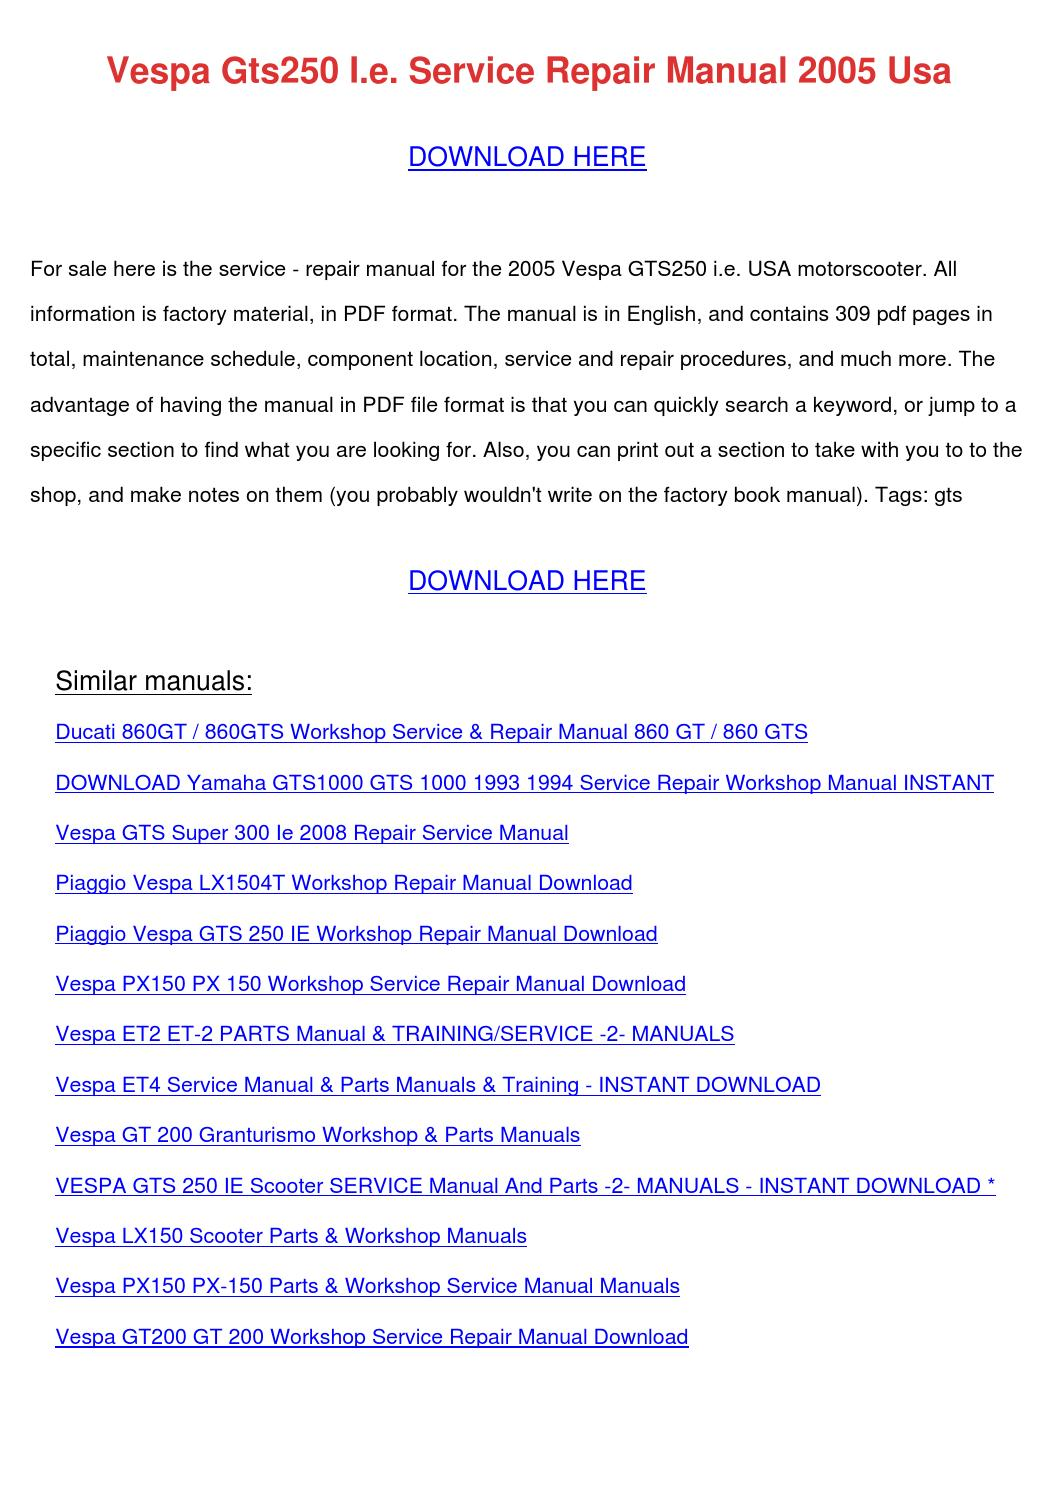 Vespa Gts250 Ie Service Repair Manual 2005 Us By